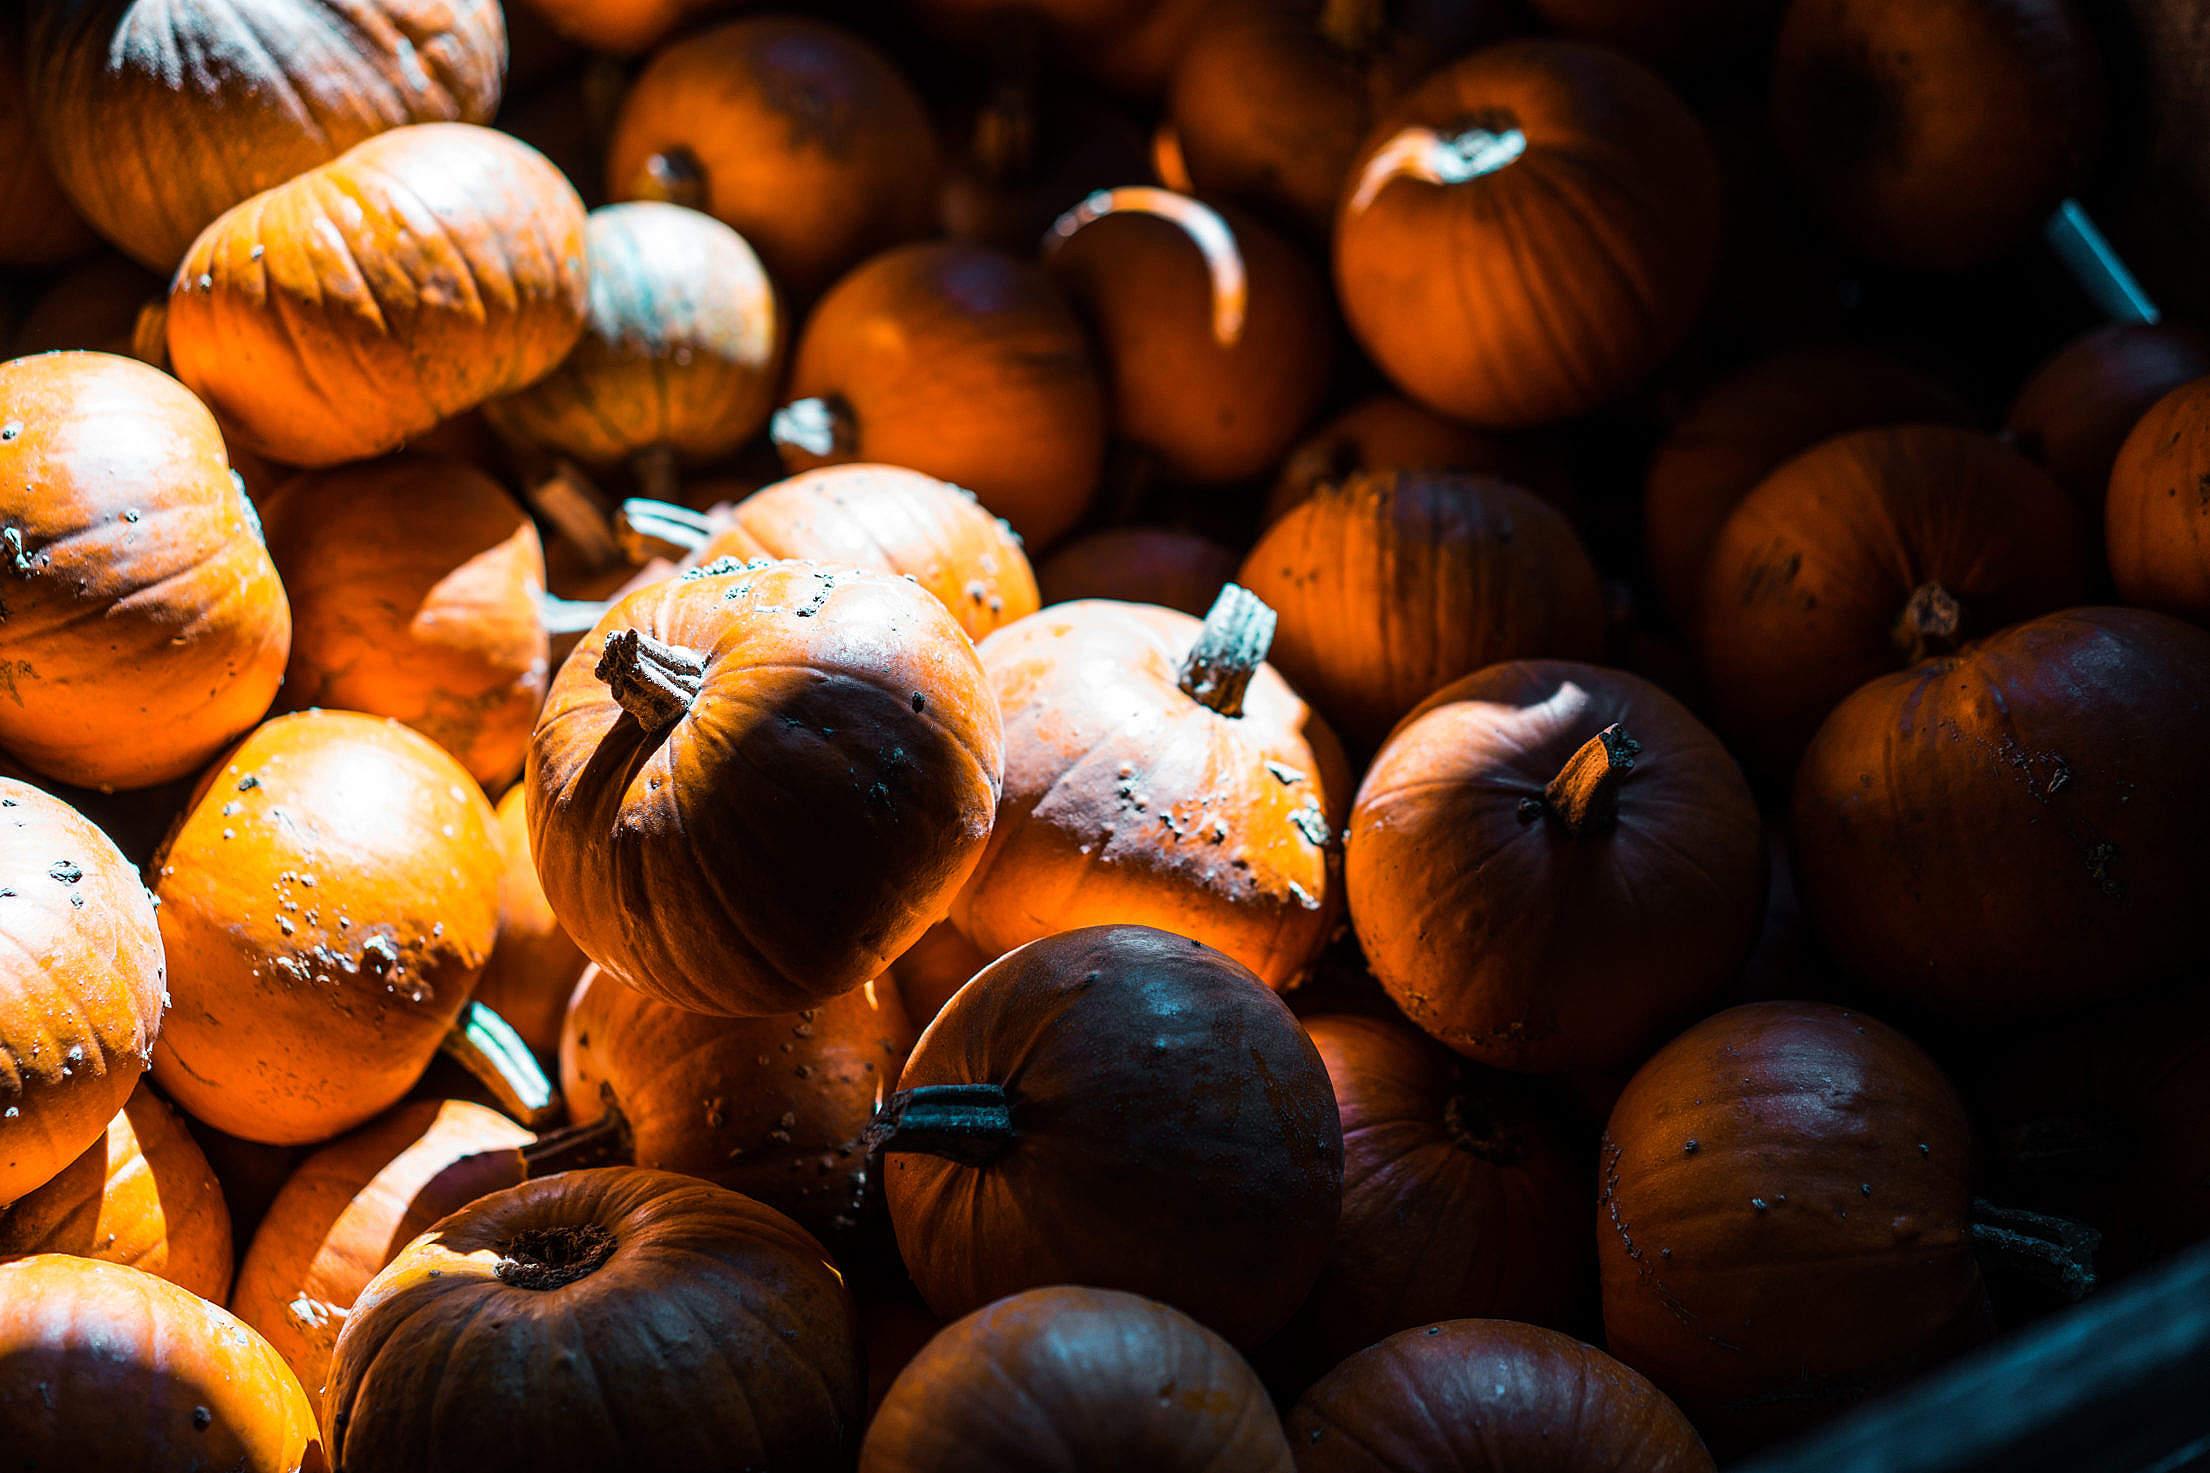 Pile of Pumpkins Free Stock Photo